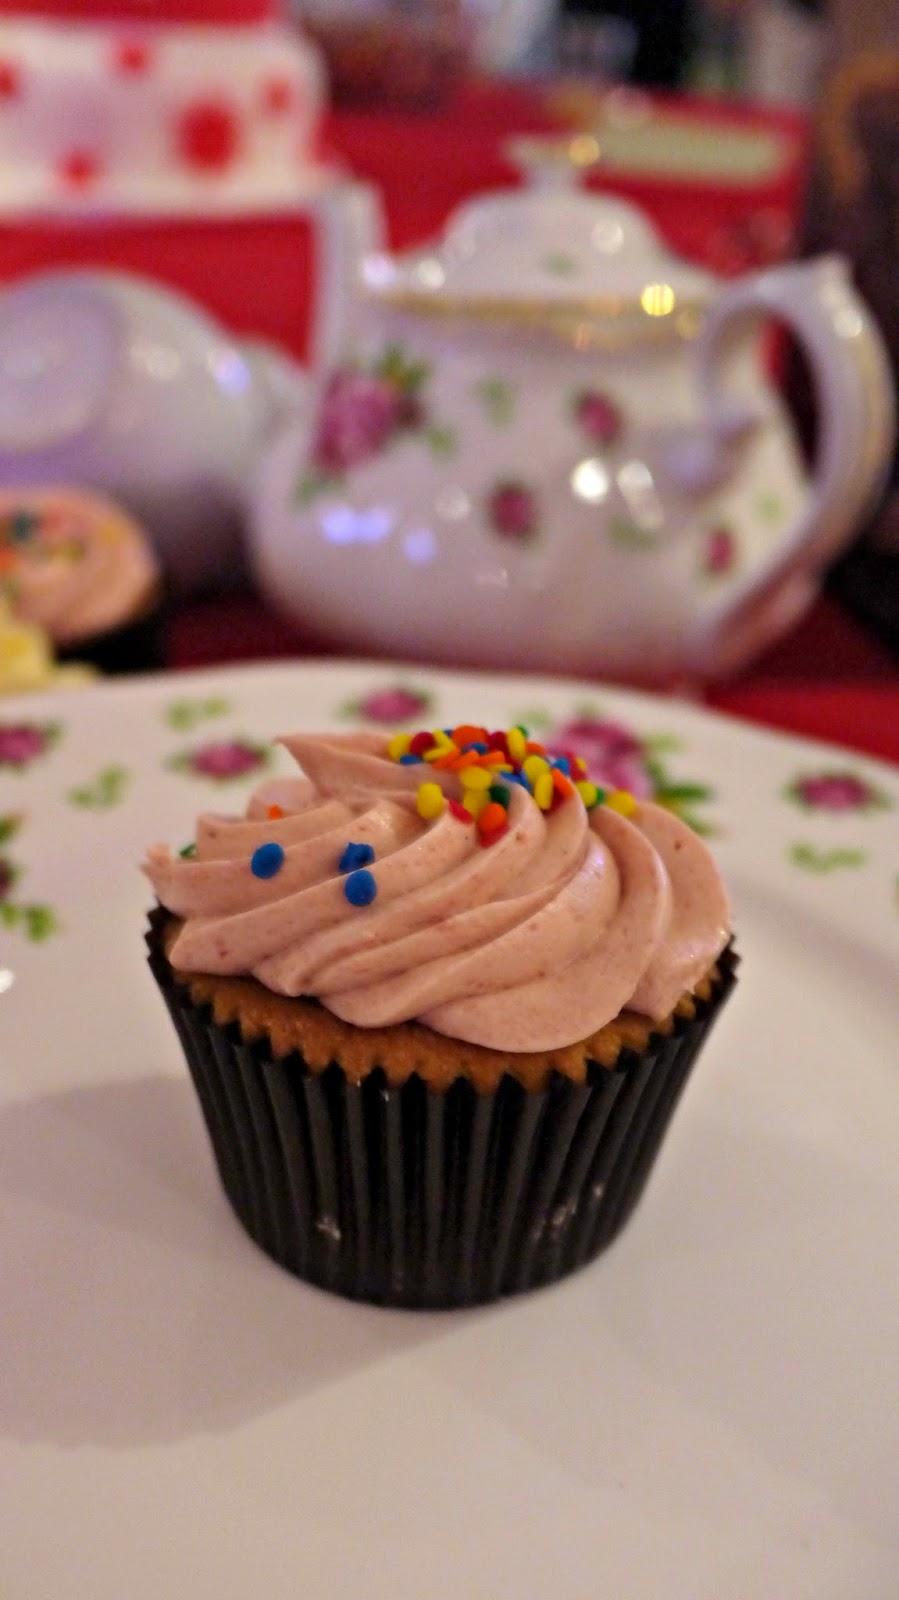 Beas of Bloomsbury cupcake at Yelp 10th birthday party